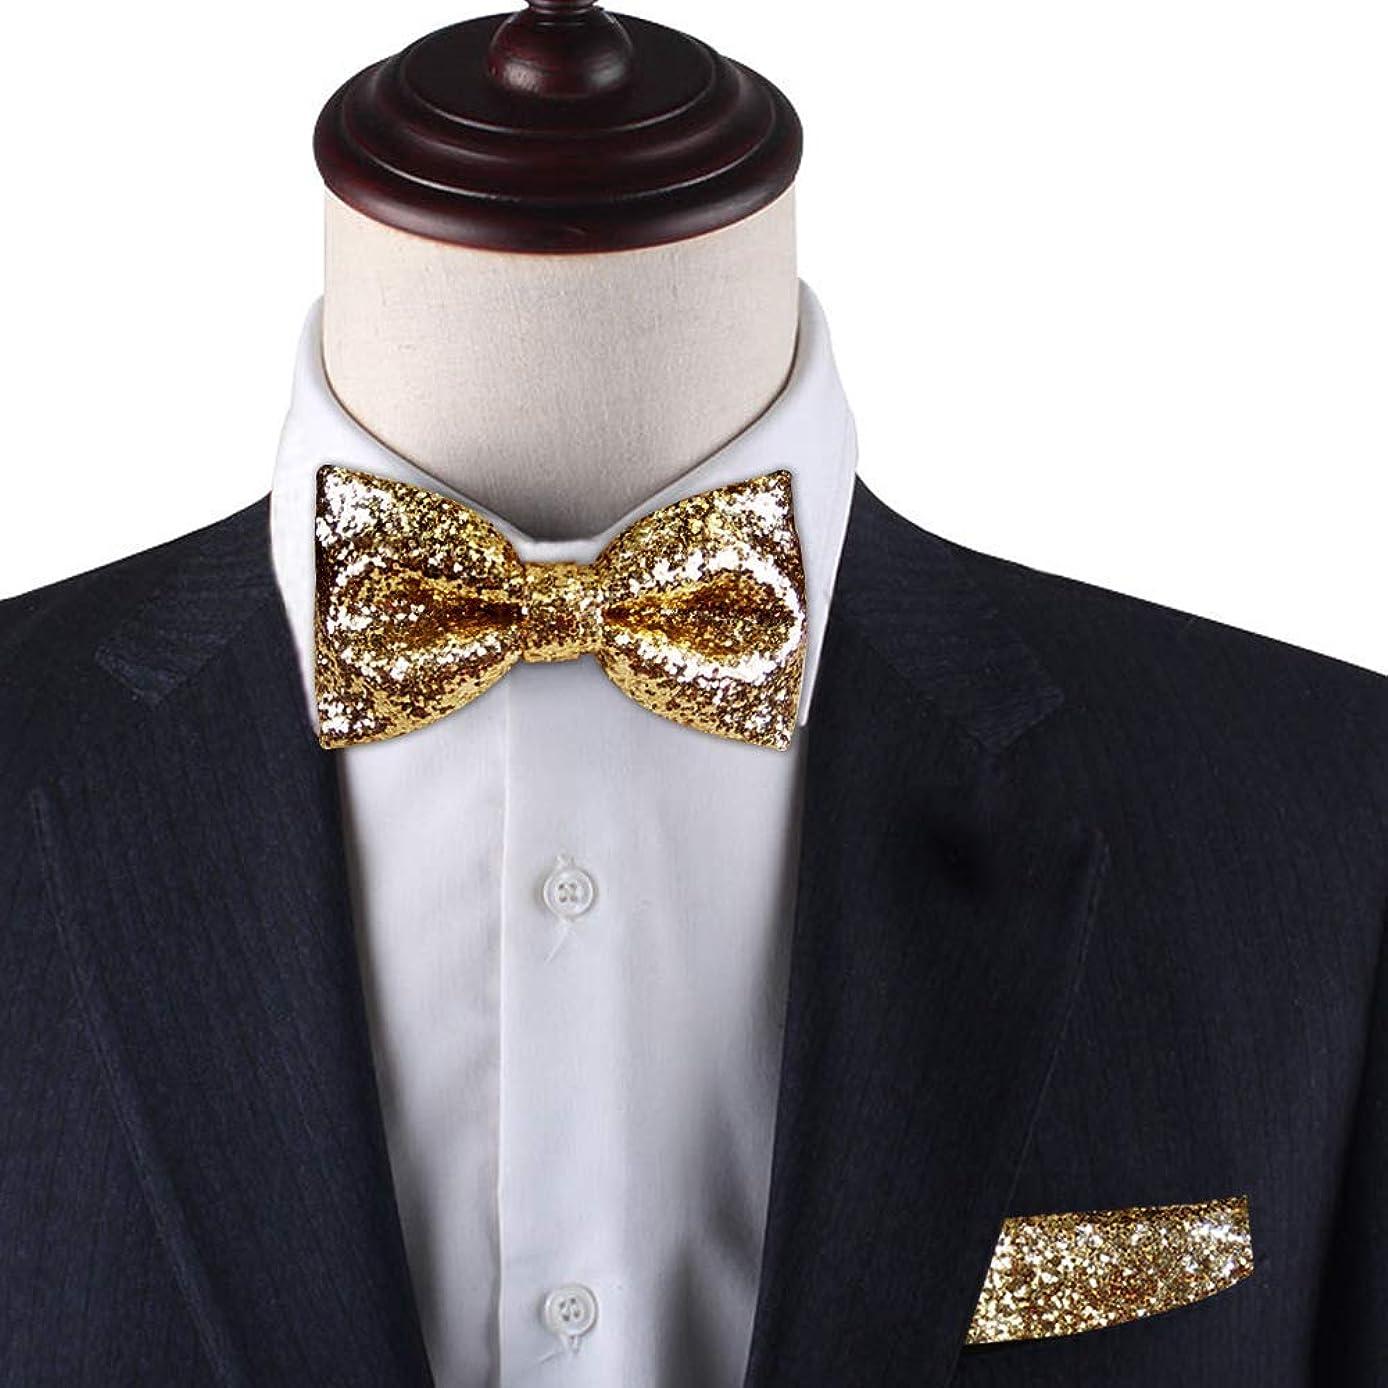 Gold Glitter pre-tied bow tie & Pocket Square set, Gold Glitter bow tie set for men, Dream Up Idea, 100% Handmade